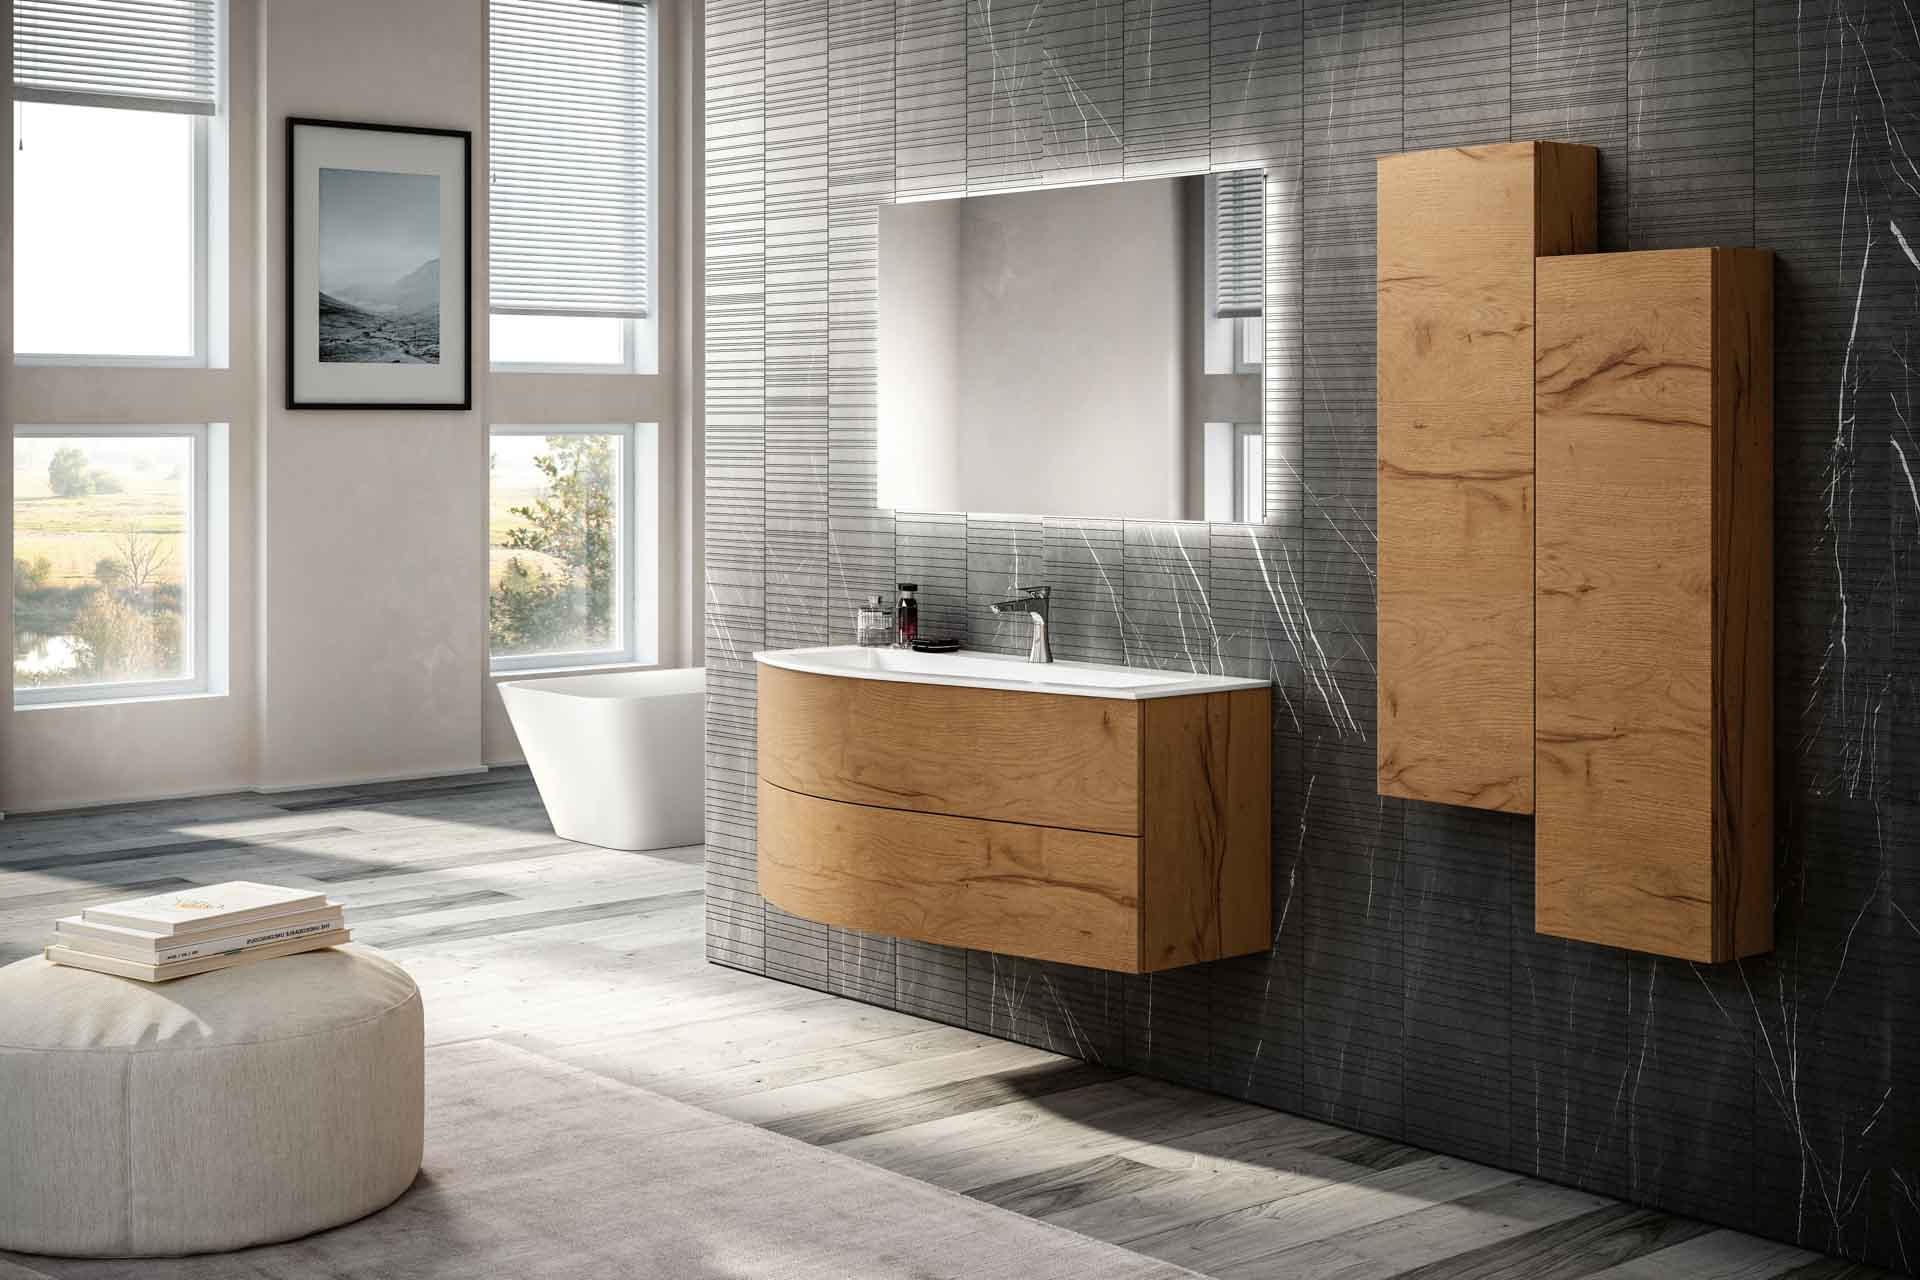 Floating Bathroom Vanity Latitudine European Cabinets